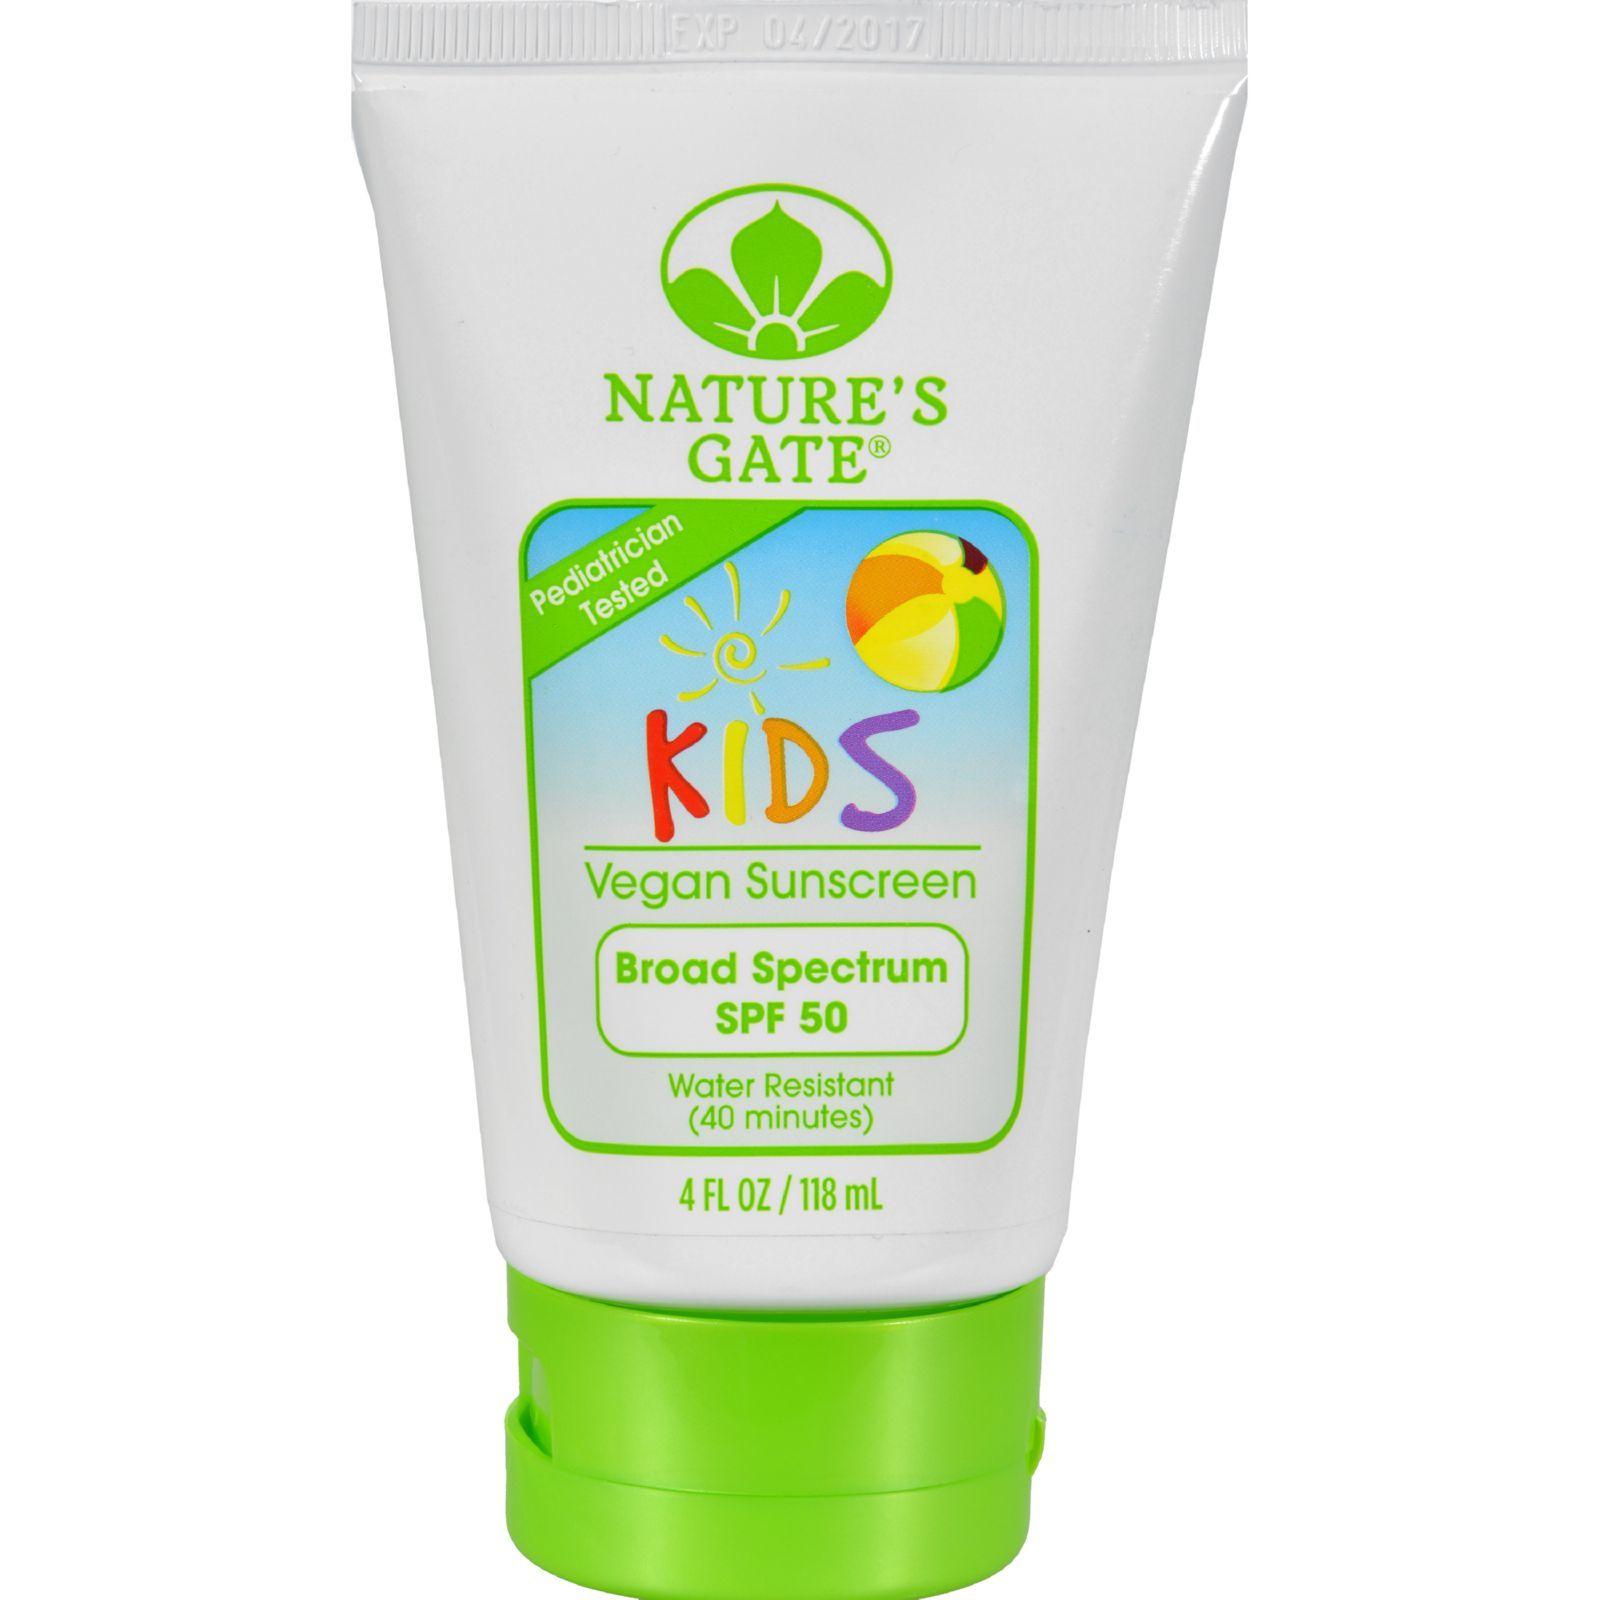 Nature's Gate Kid's Block SPF 50 Sunscreen Lotion - 4 fl oz